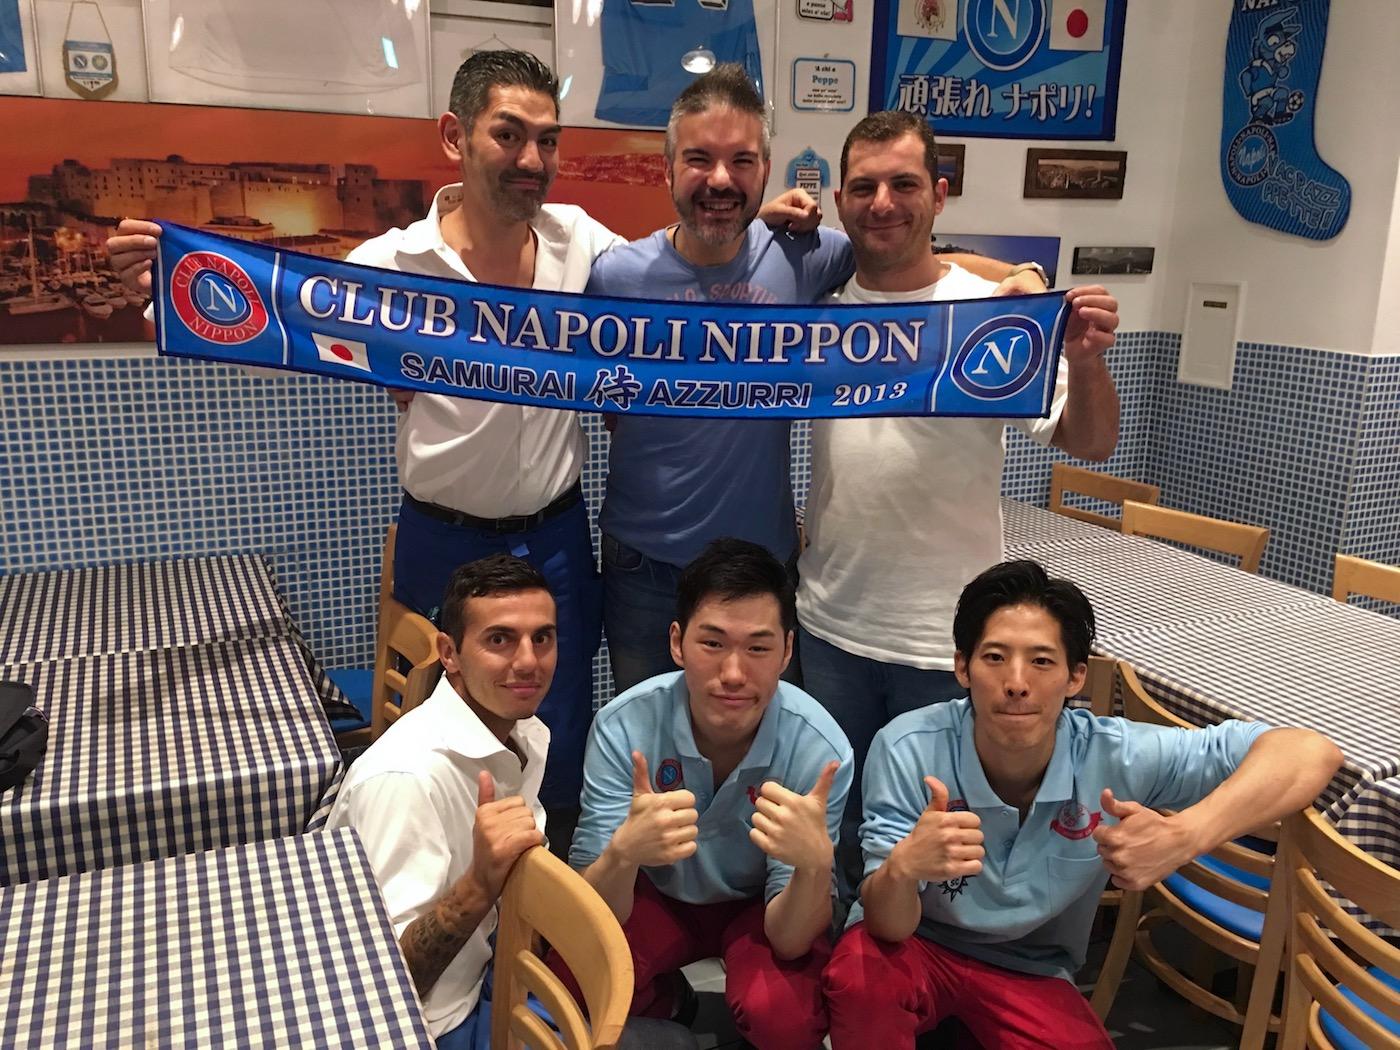 Club Napoli Nippon – Samurai Azzurri!